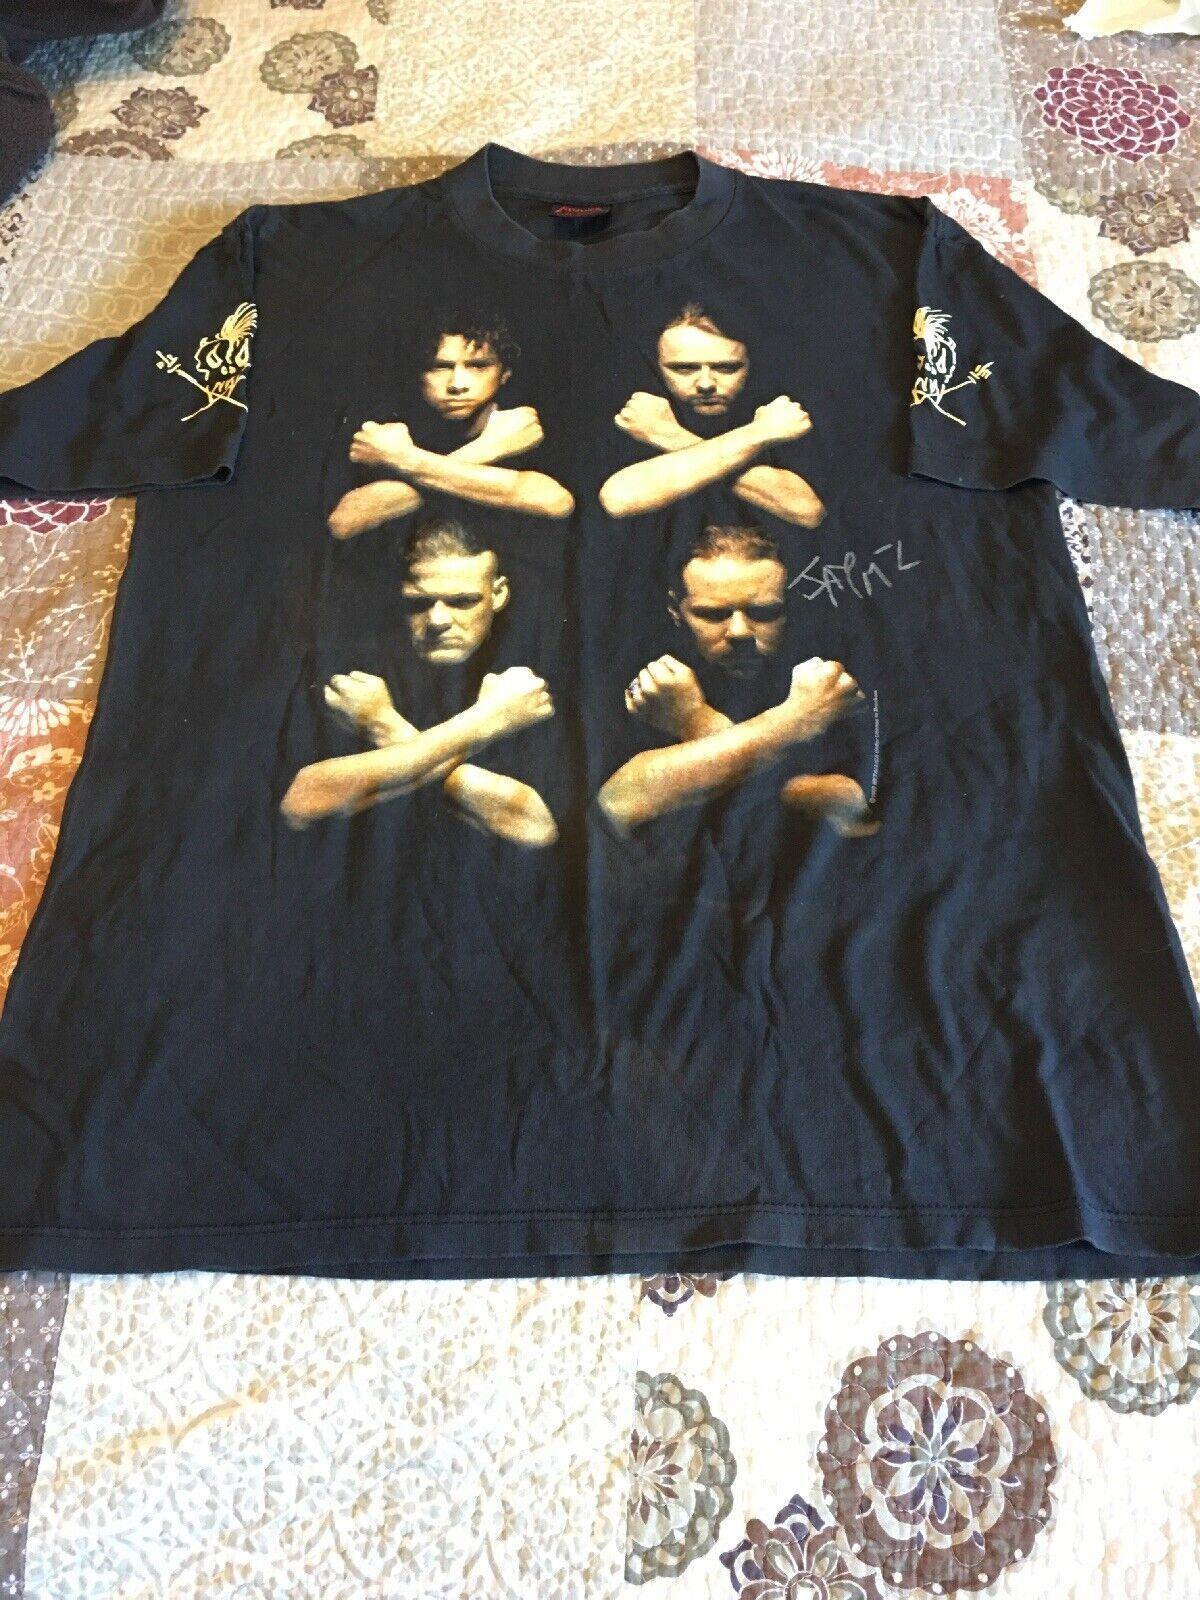 Signed Authentic Vintage METALLICA T Shirt LG Birth School Metallica Death